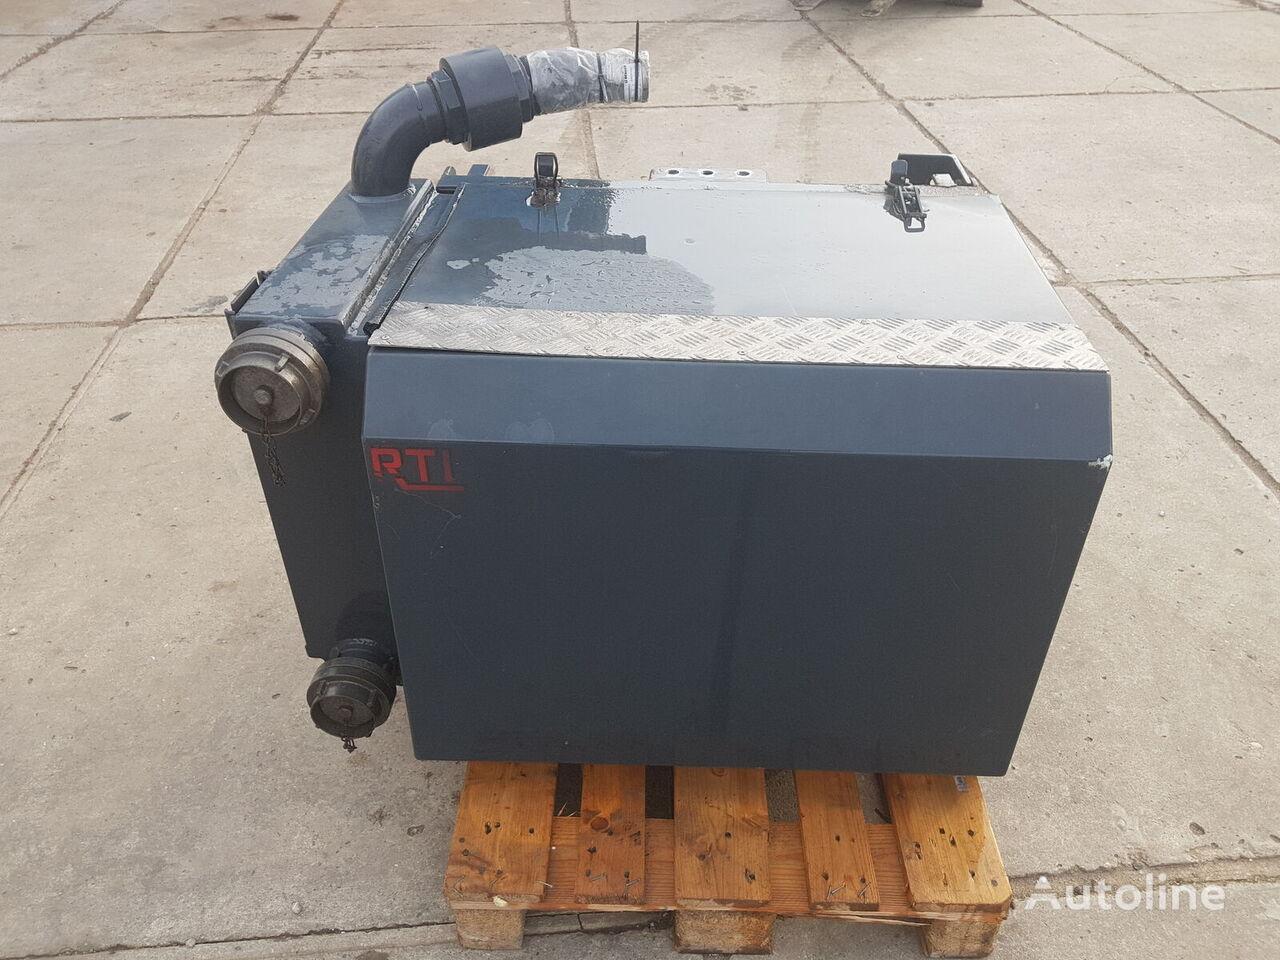 vzduchový kompresor BLOWER GARDEN DENVER T5CDL12 pro cisterny návěsy